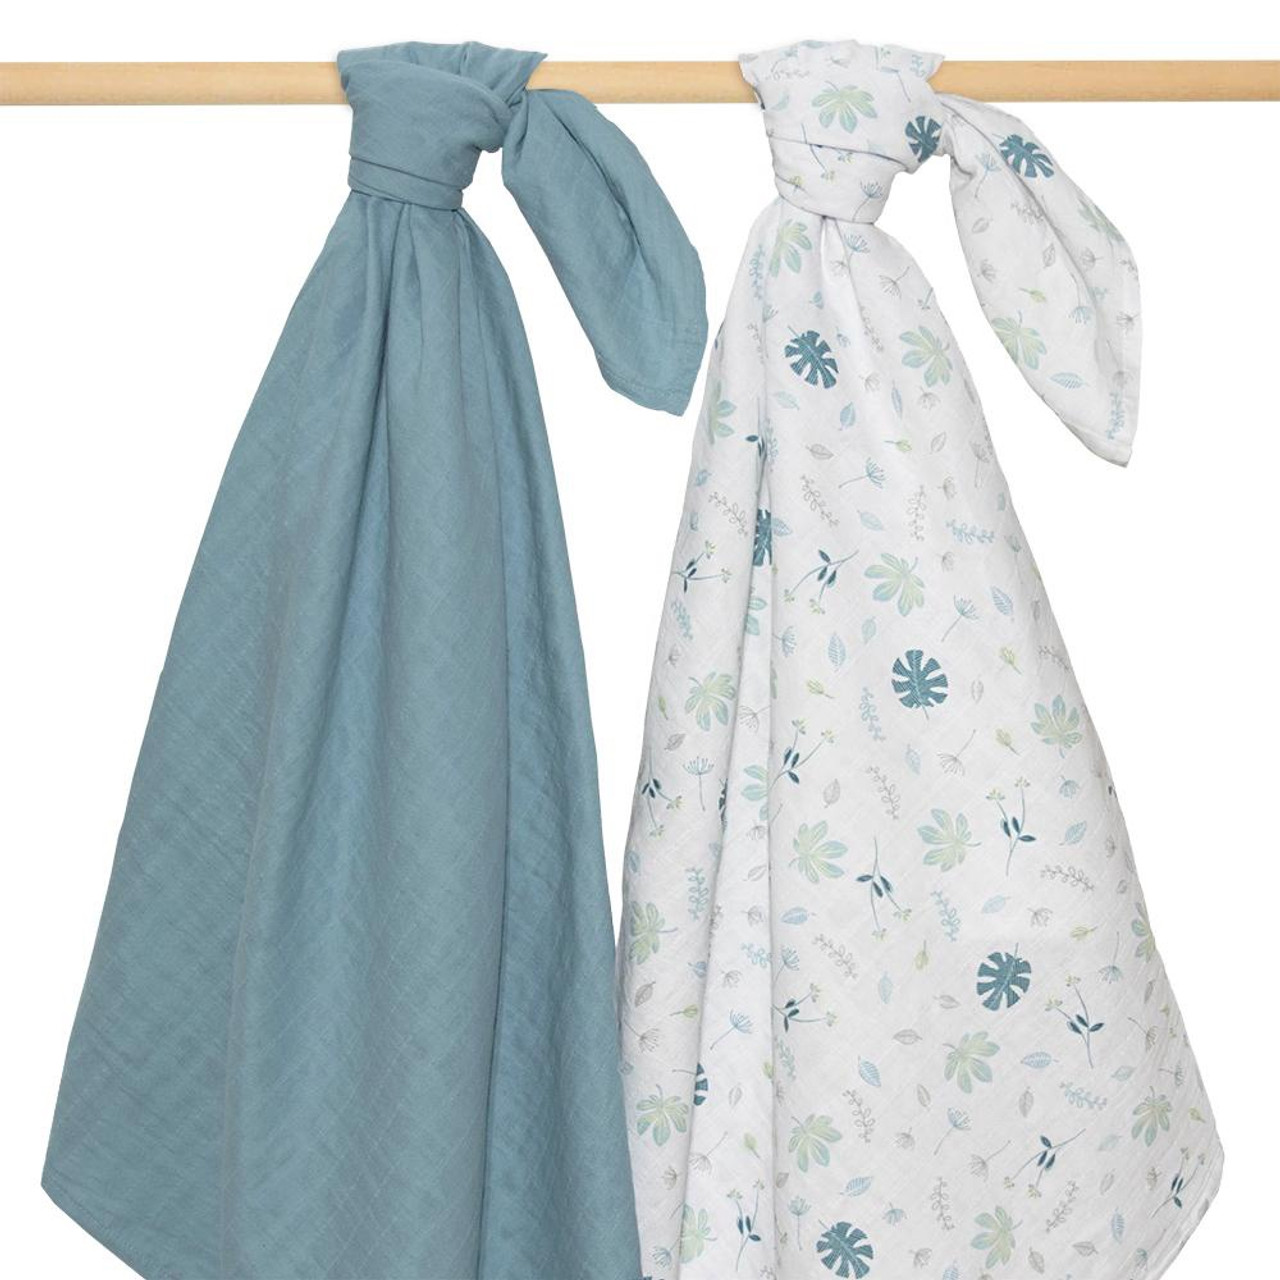 Living Textiles Organic Cotton 2pk Muslin Swaddles